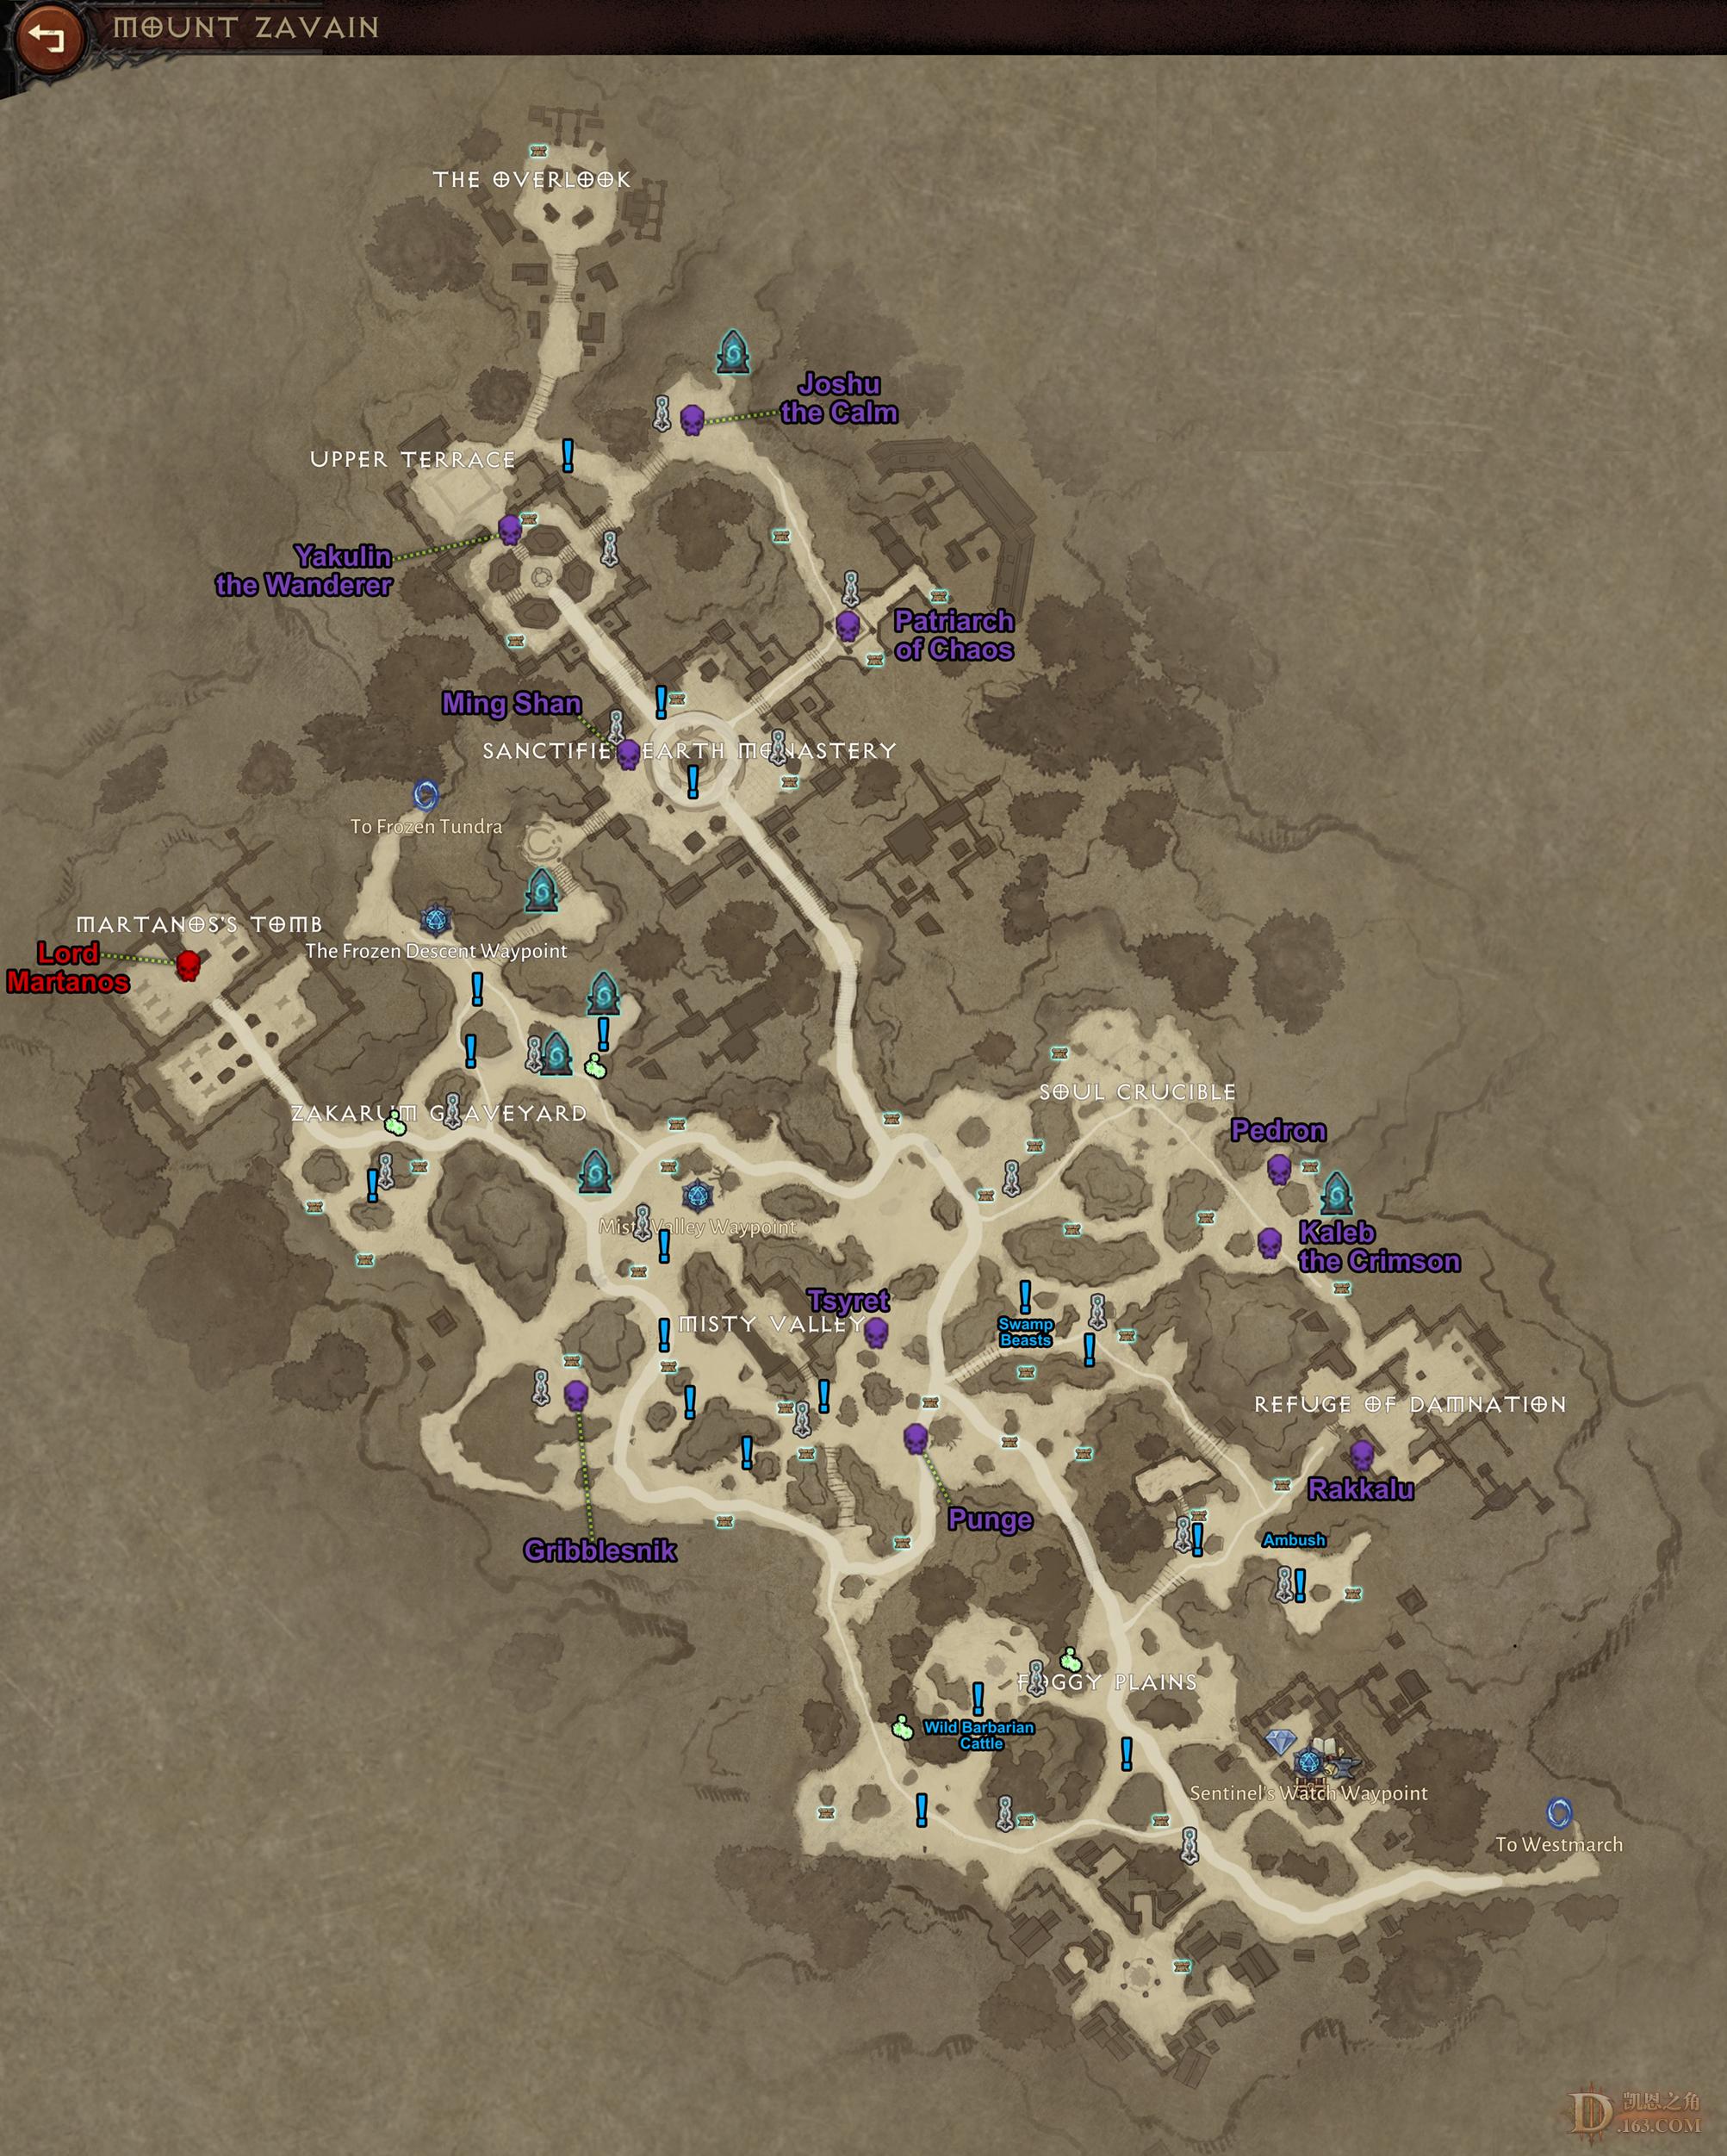 mount-zavain-purple-rare-elites-no-skull.png